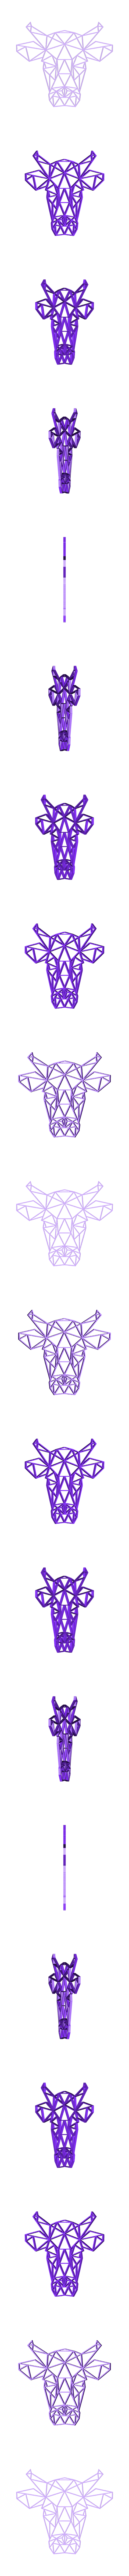 bull1.stl Download free STL file Bull Wall Sculpture 2D • 3D print model, UnpredictableLab